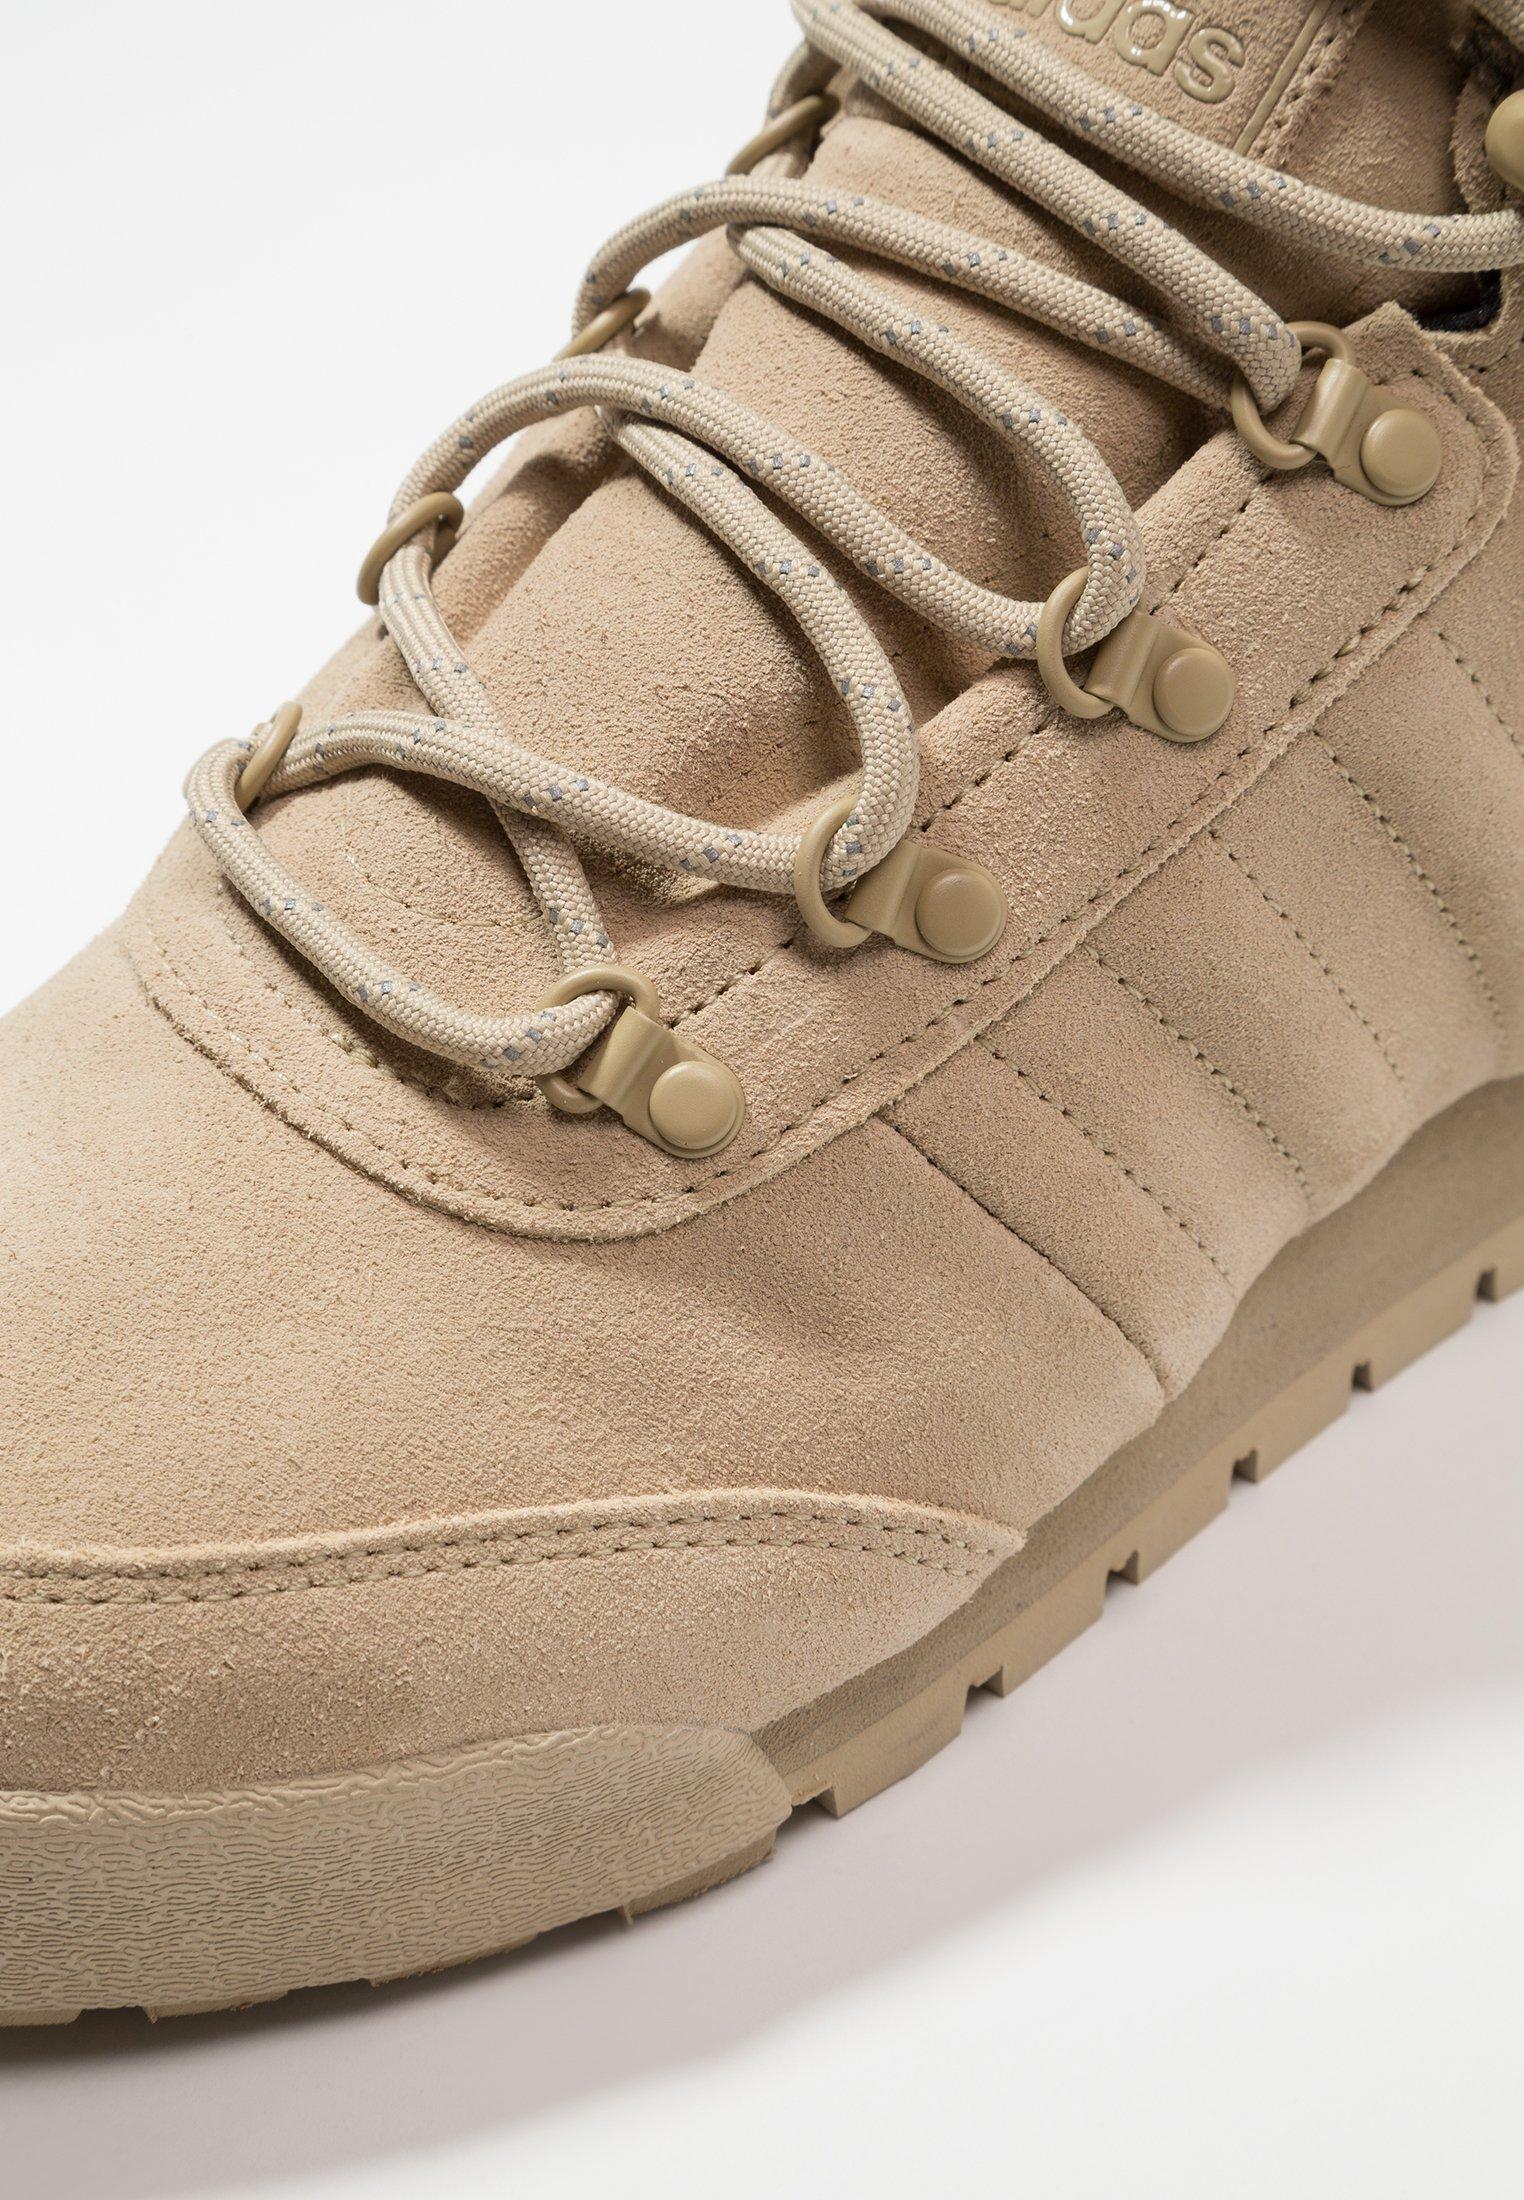 JAKE BOOT 2.0 Sneaker high raw goldcore blackgold metallic